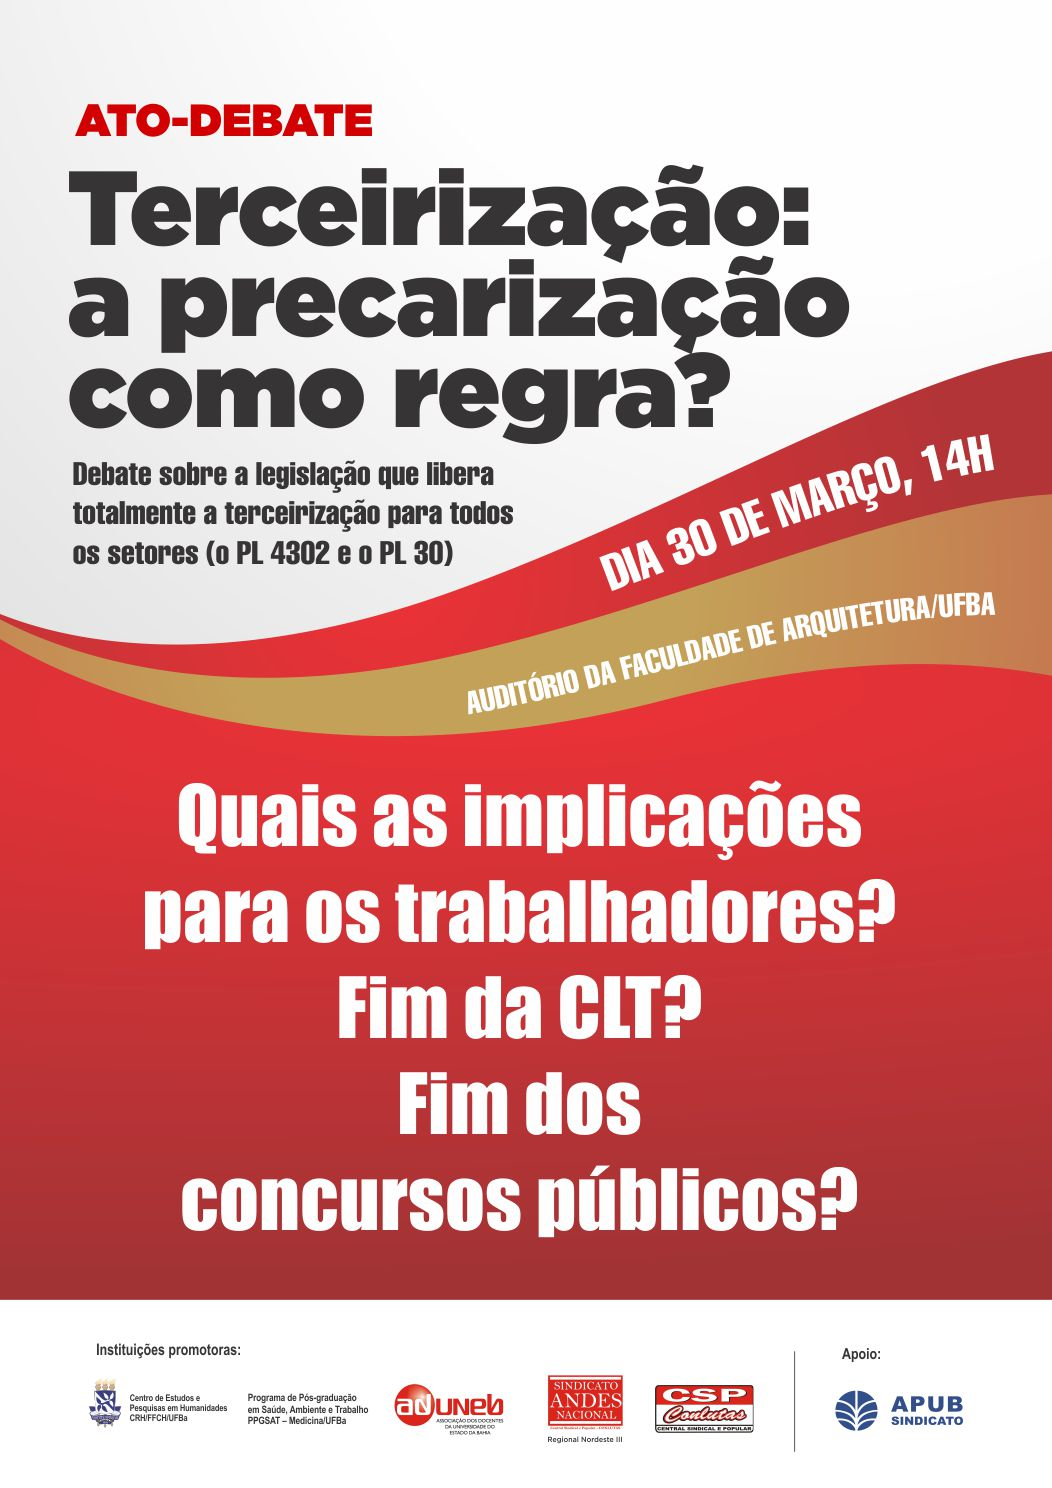 http://www.apub.org.br/wp-content/uploads/2017/03/CARTAZ-TERCEIRIZACAO-30-MARCO-1.jpg